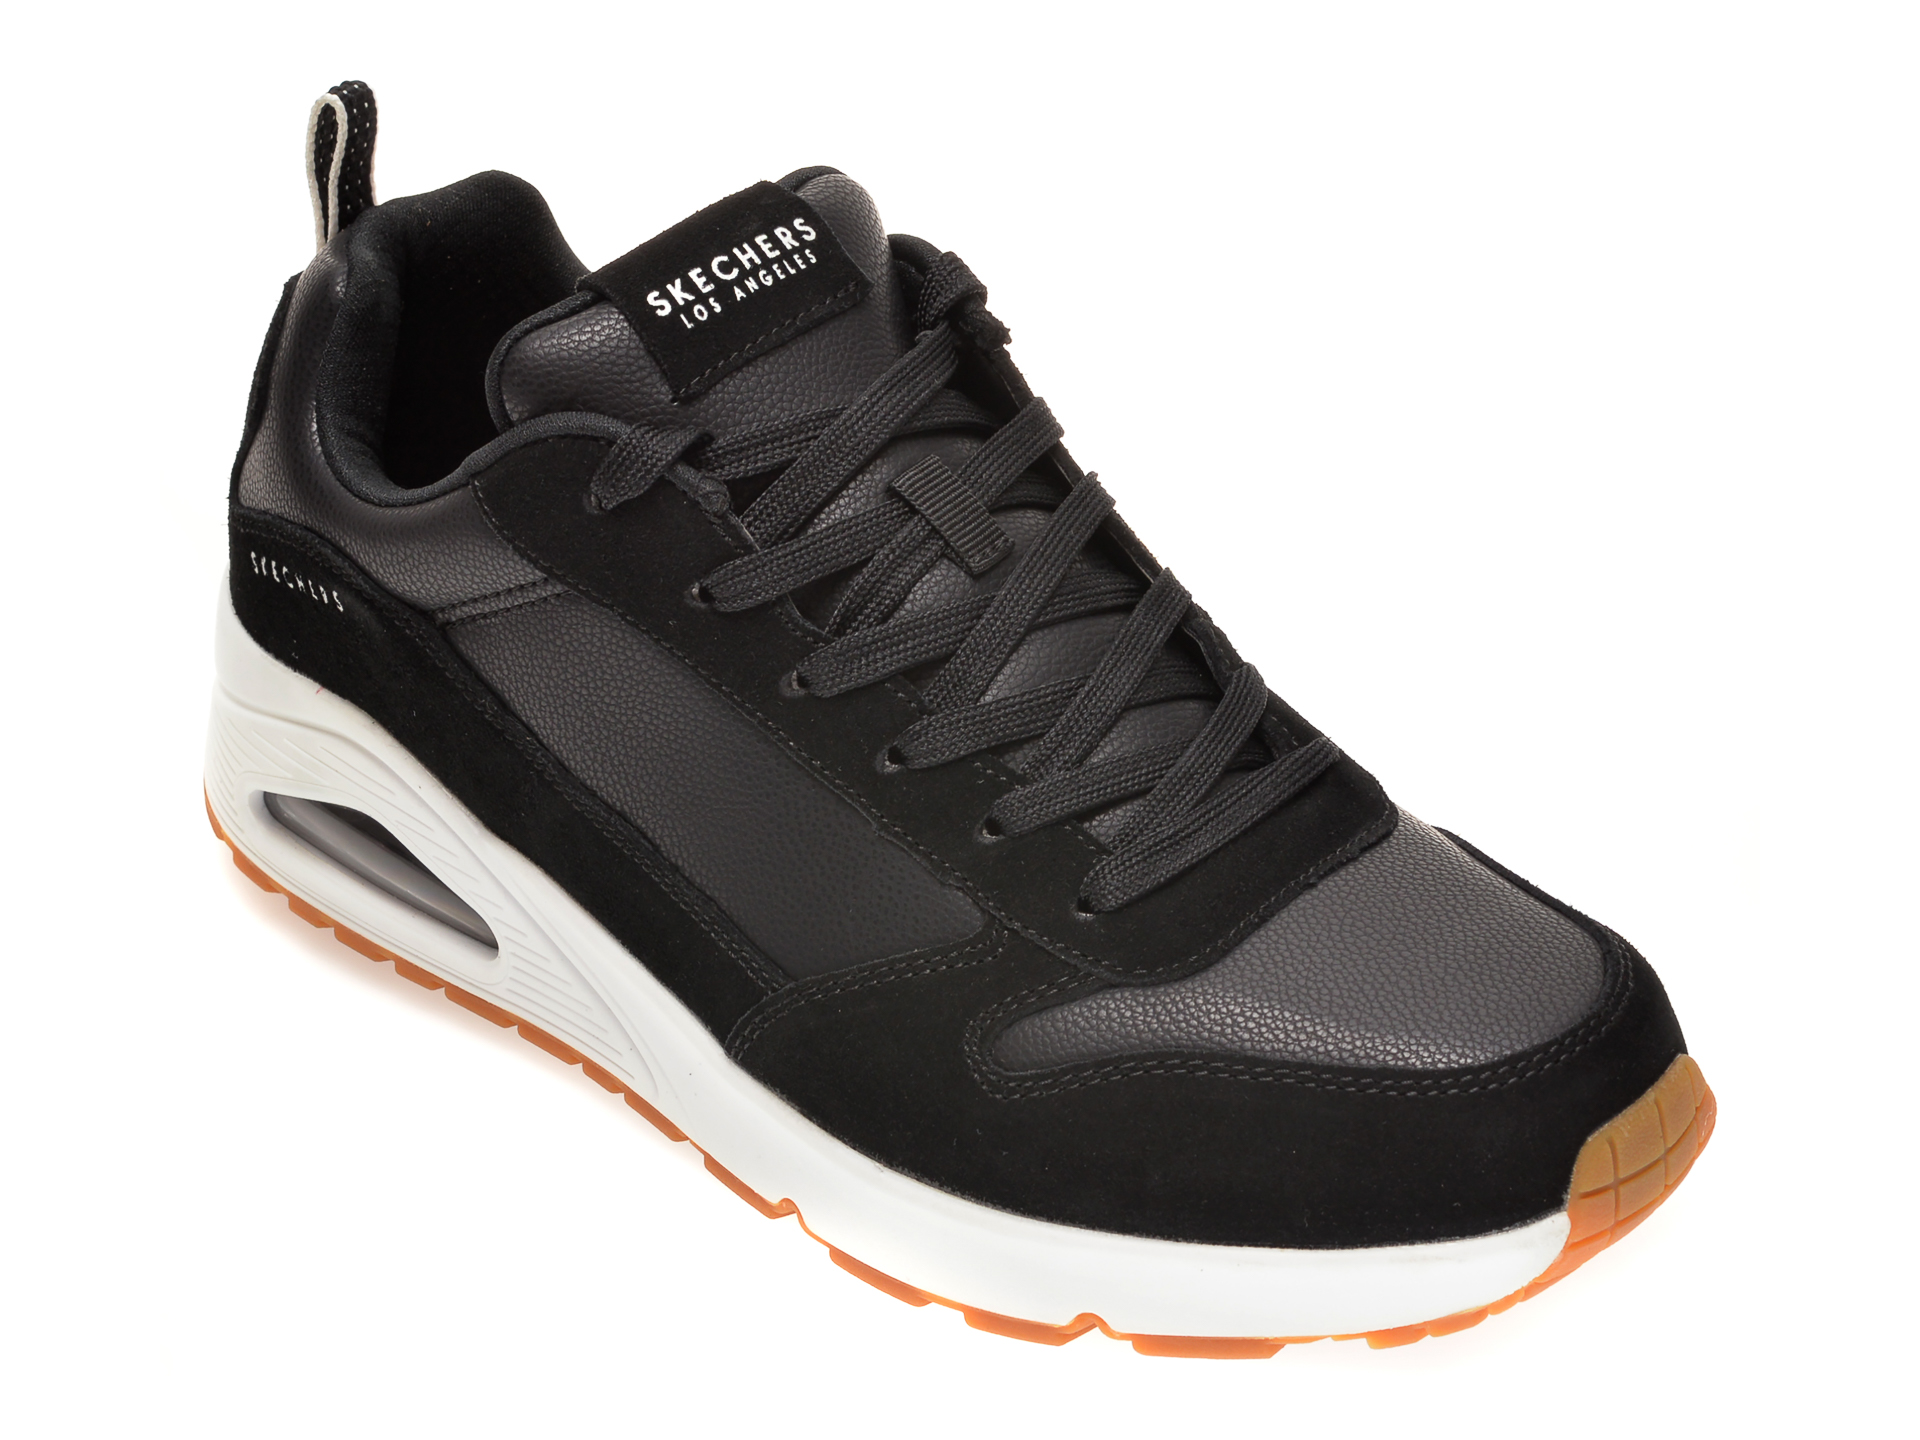 Pantofi sport SKECHERS negri, UNA STACRE, din piele ecologica imagine